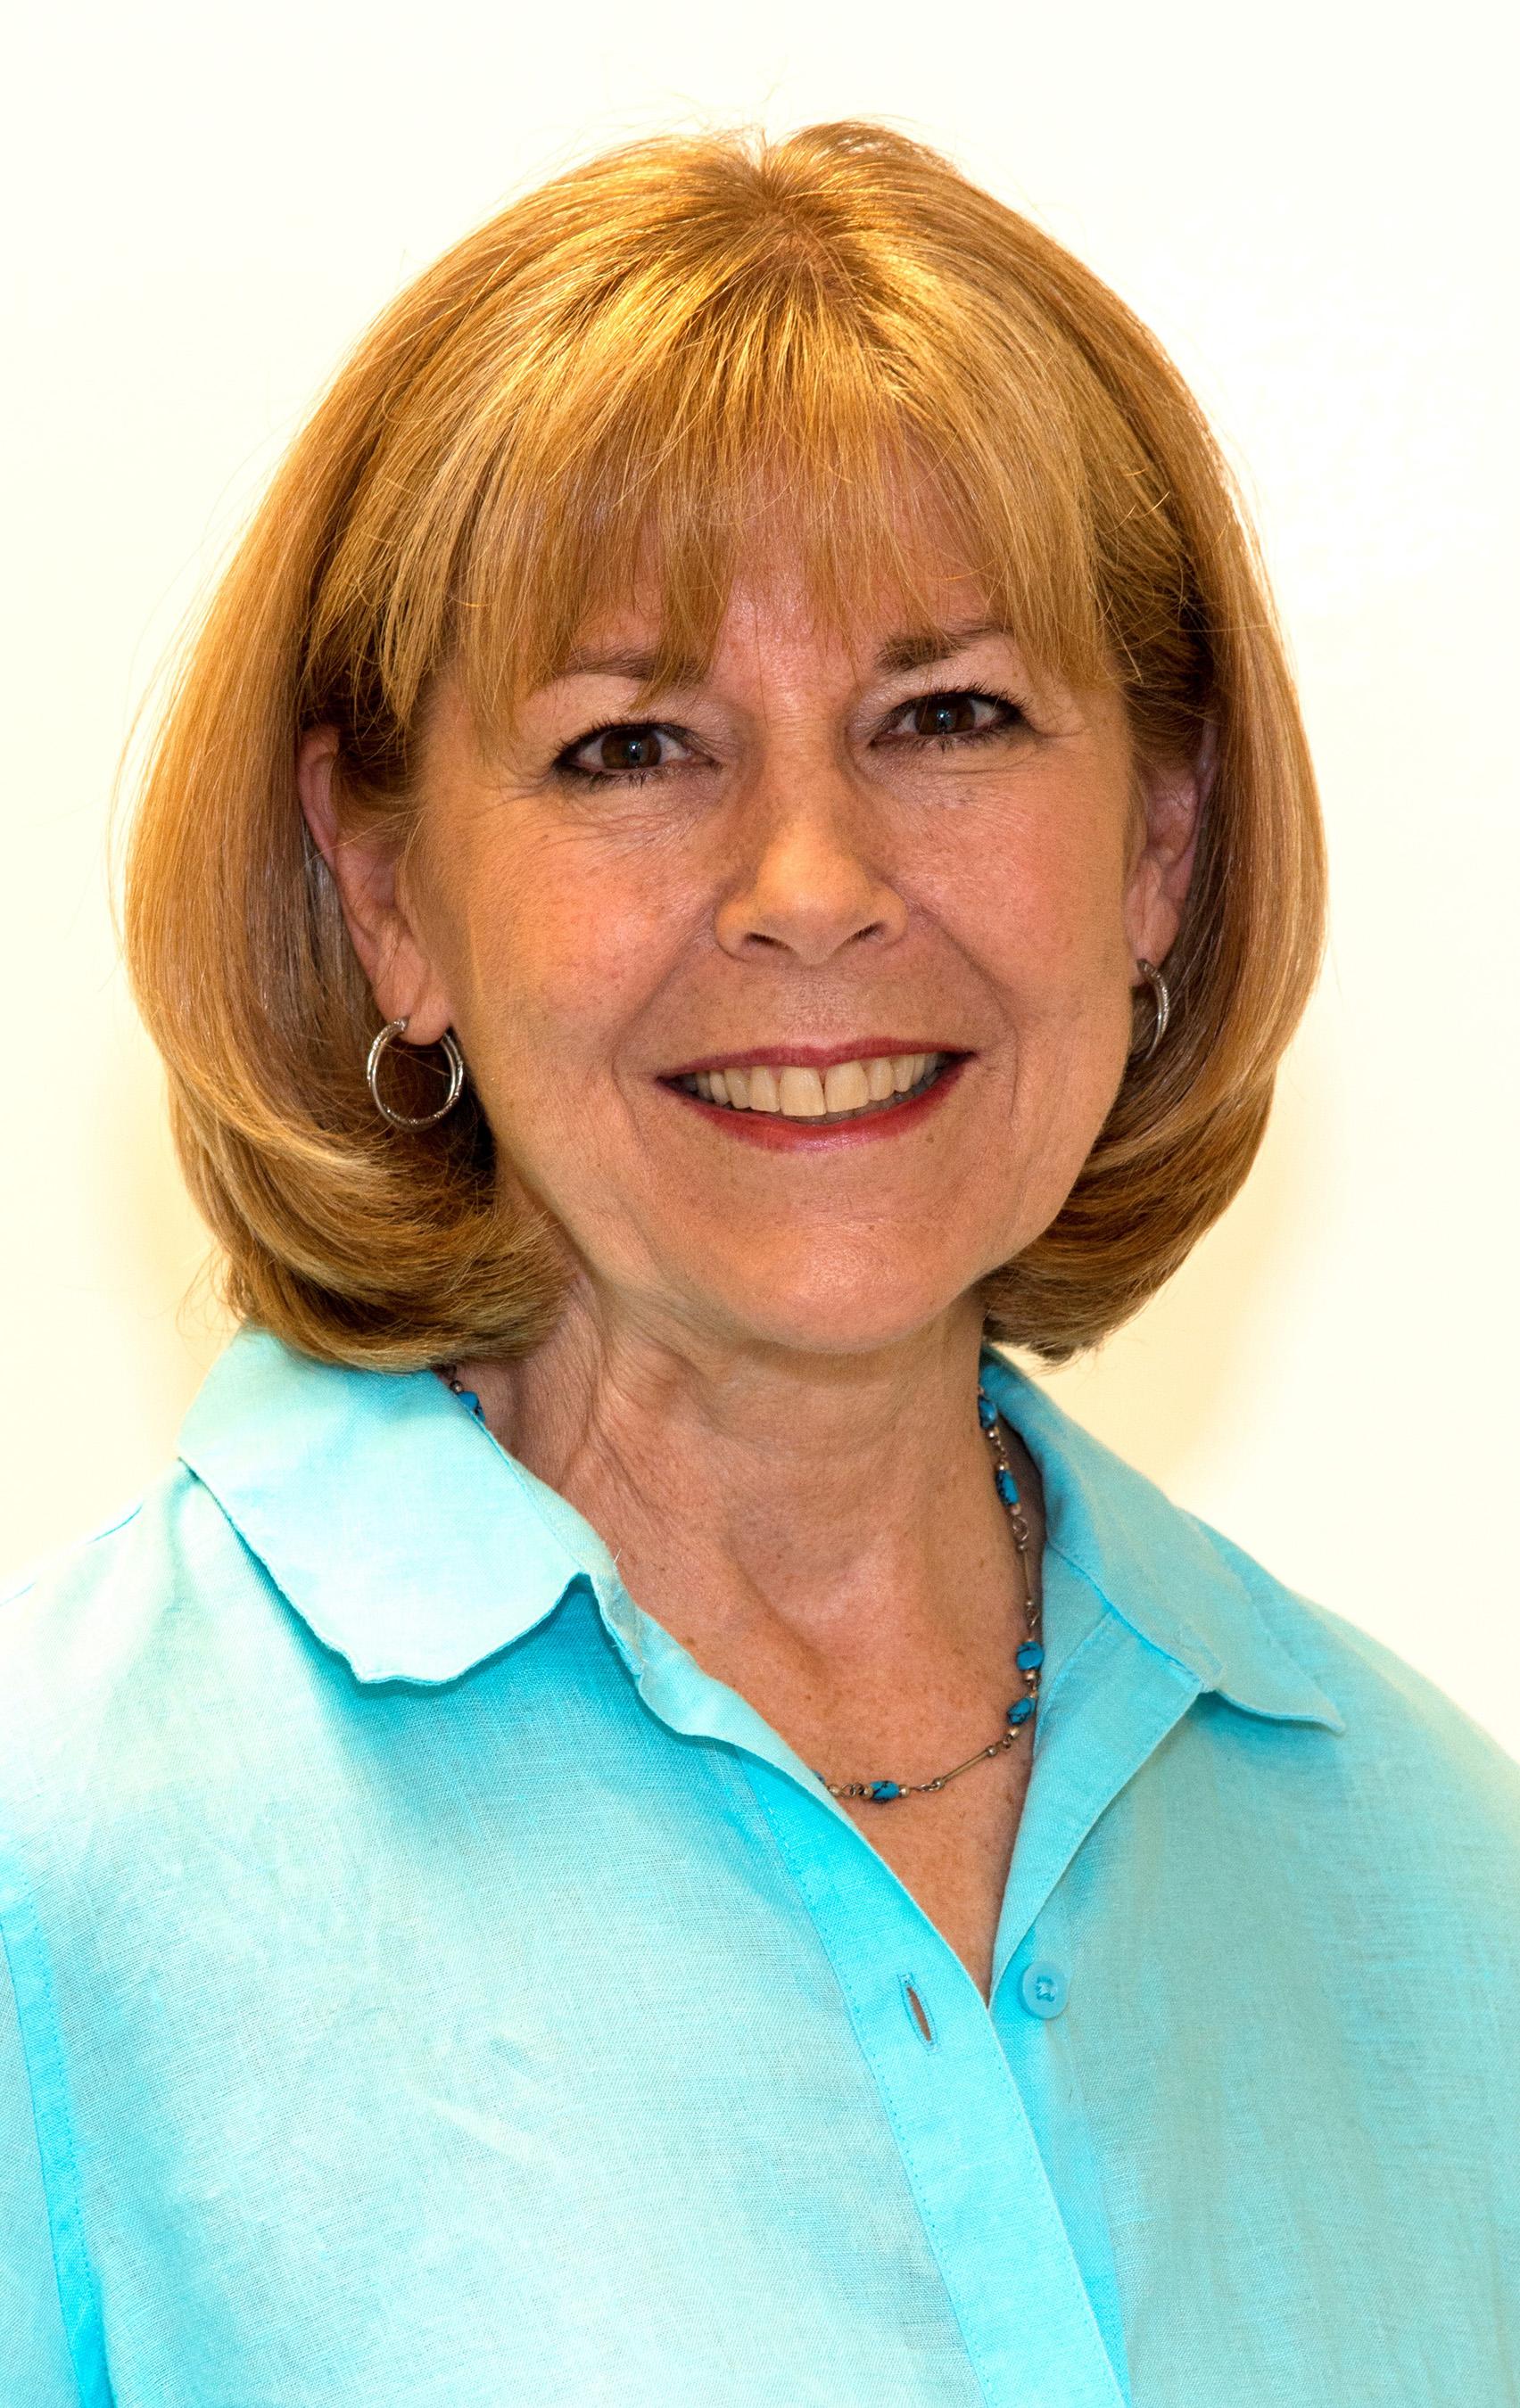 Christine Rosenbloom, PhD, RDN, FAND